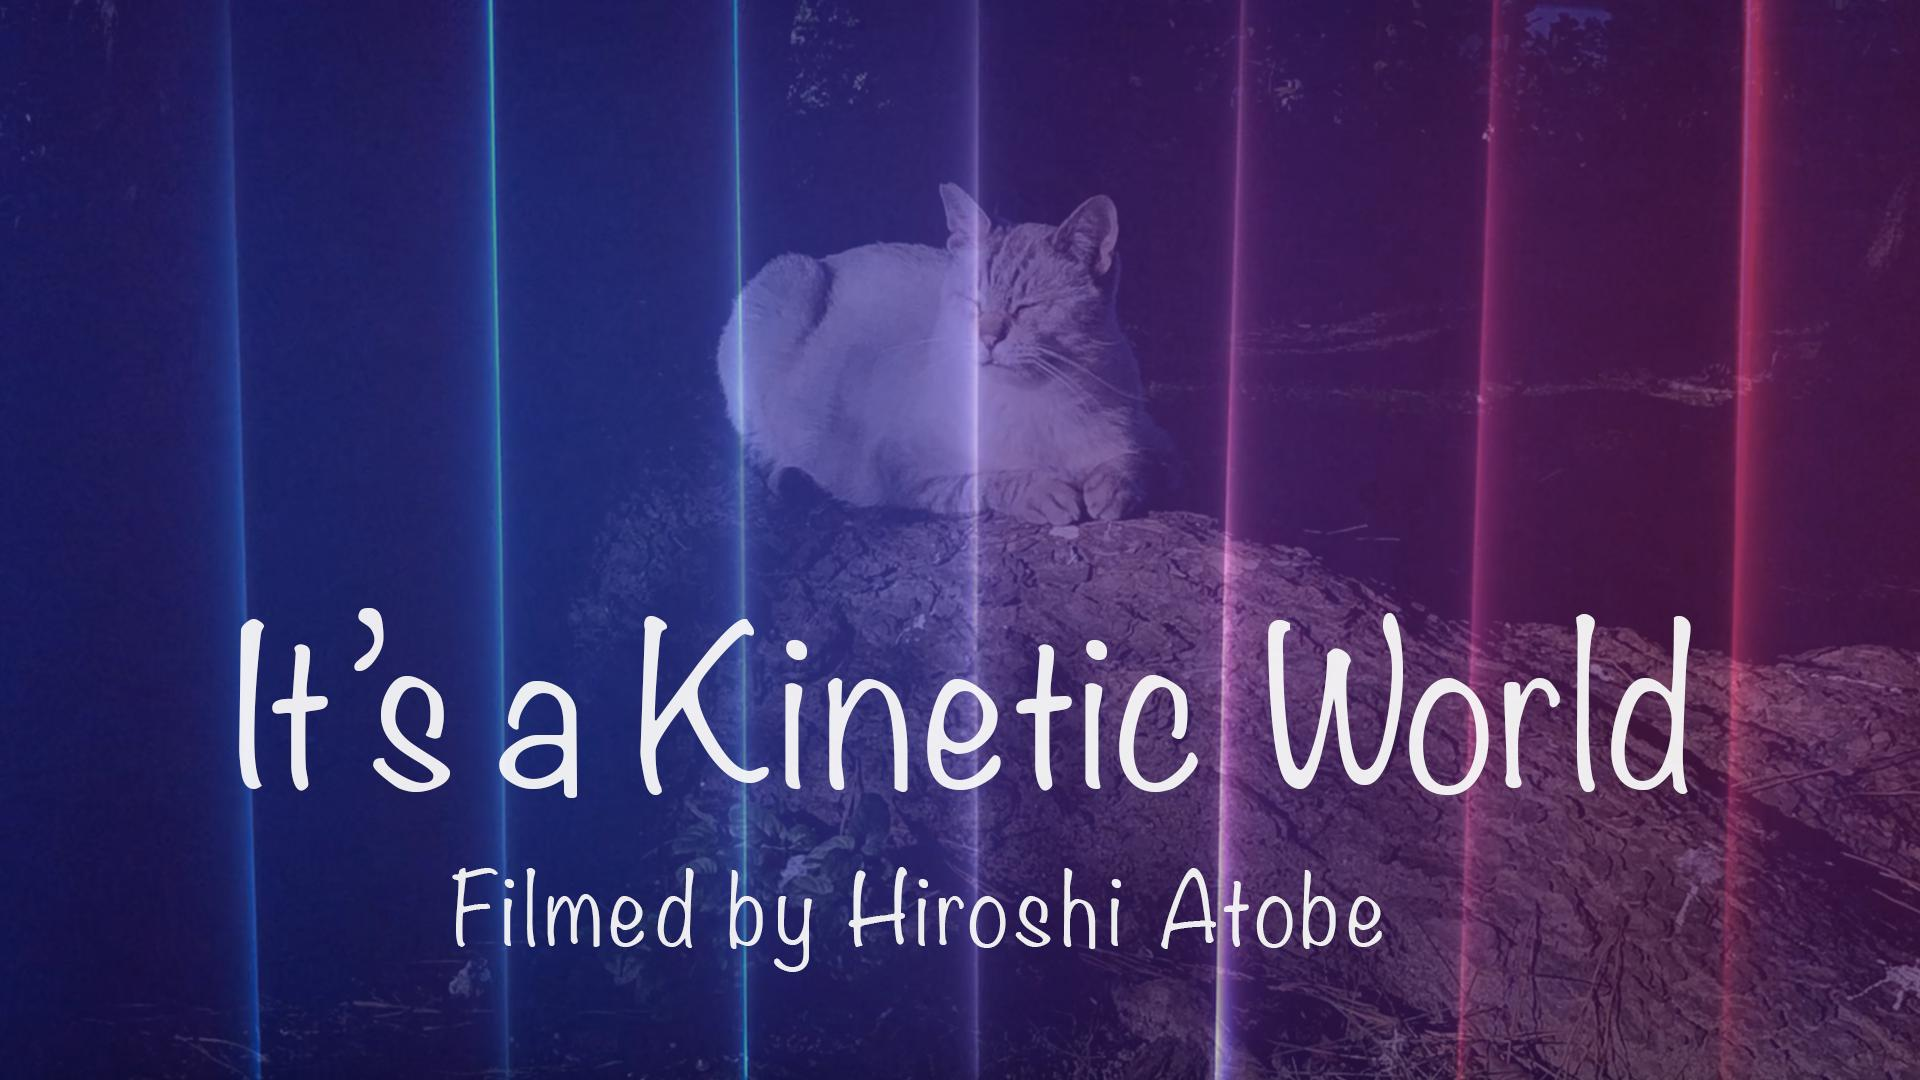 It's a Kinetic World